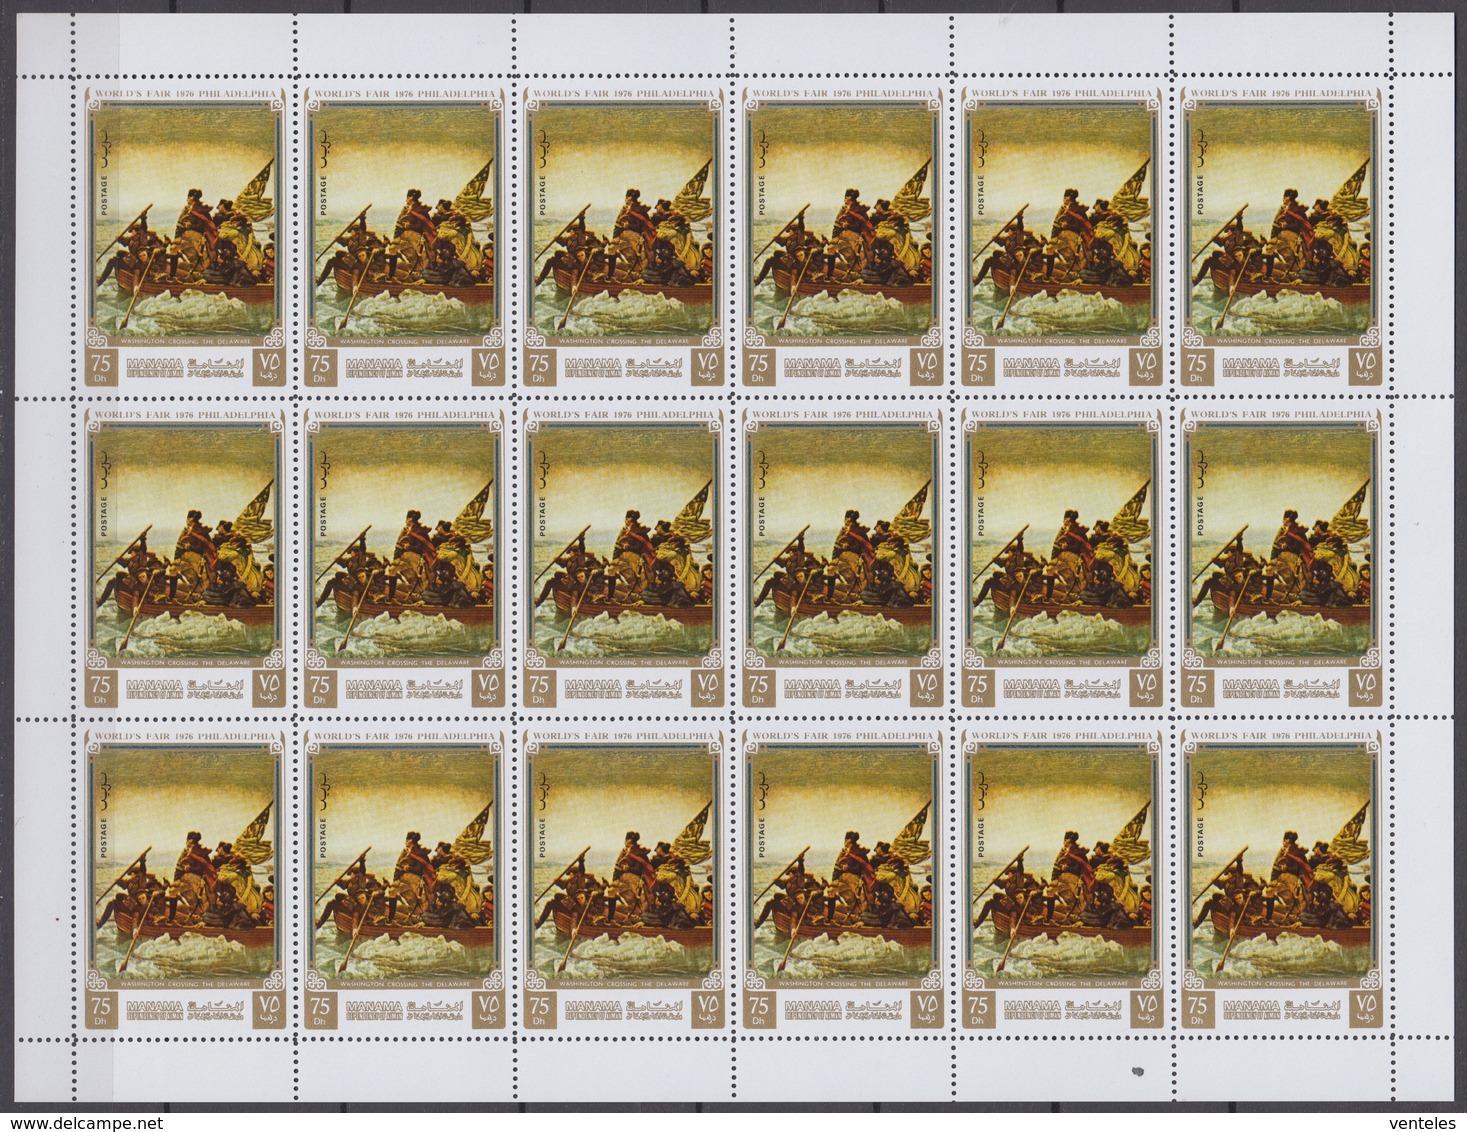 Manama 1972 SHEETS Mi # 793-98 AUnited States Bicentennial, Bicentennial Exposition In Philadelphia, G. Washington MNH - Unabhängigkeit USA